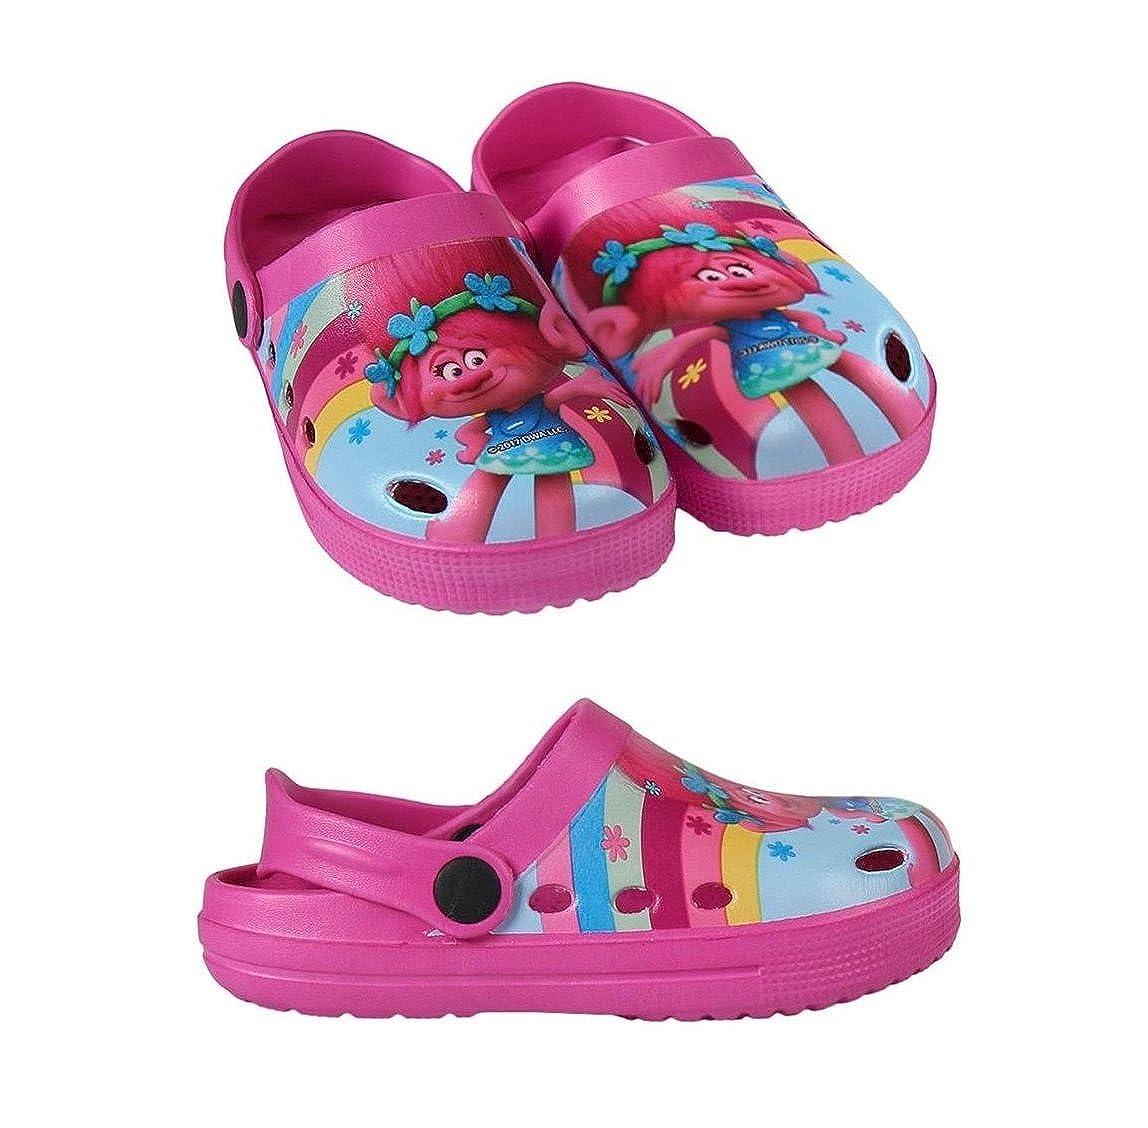 takestop Slippers Crocs Slippers Sea Rubber Non-Slip Poppy Trolls Beach Clogs Cartoon Pool Sea Girl Child Unisex